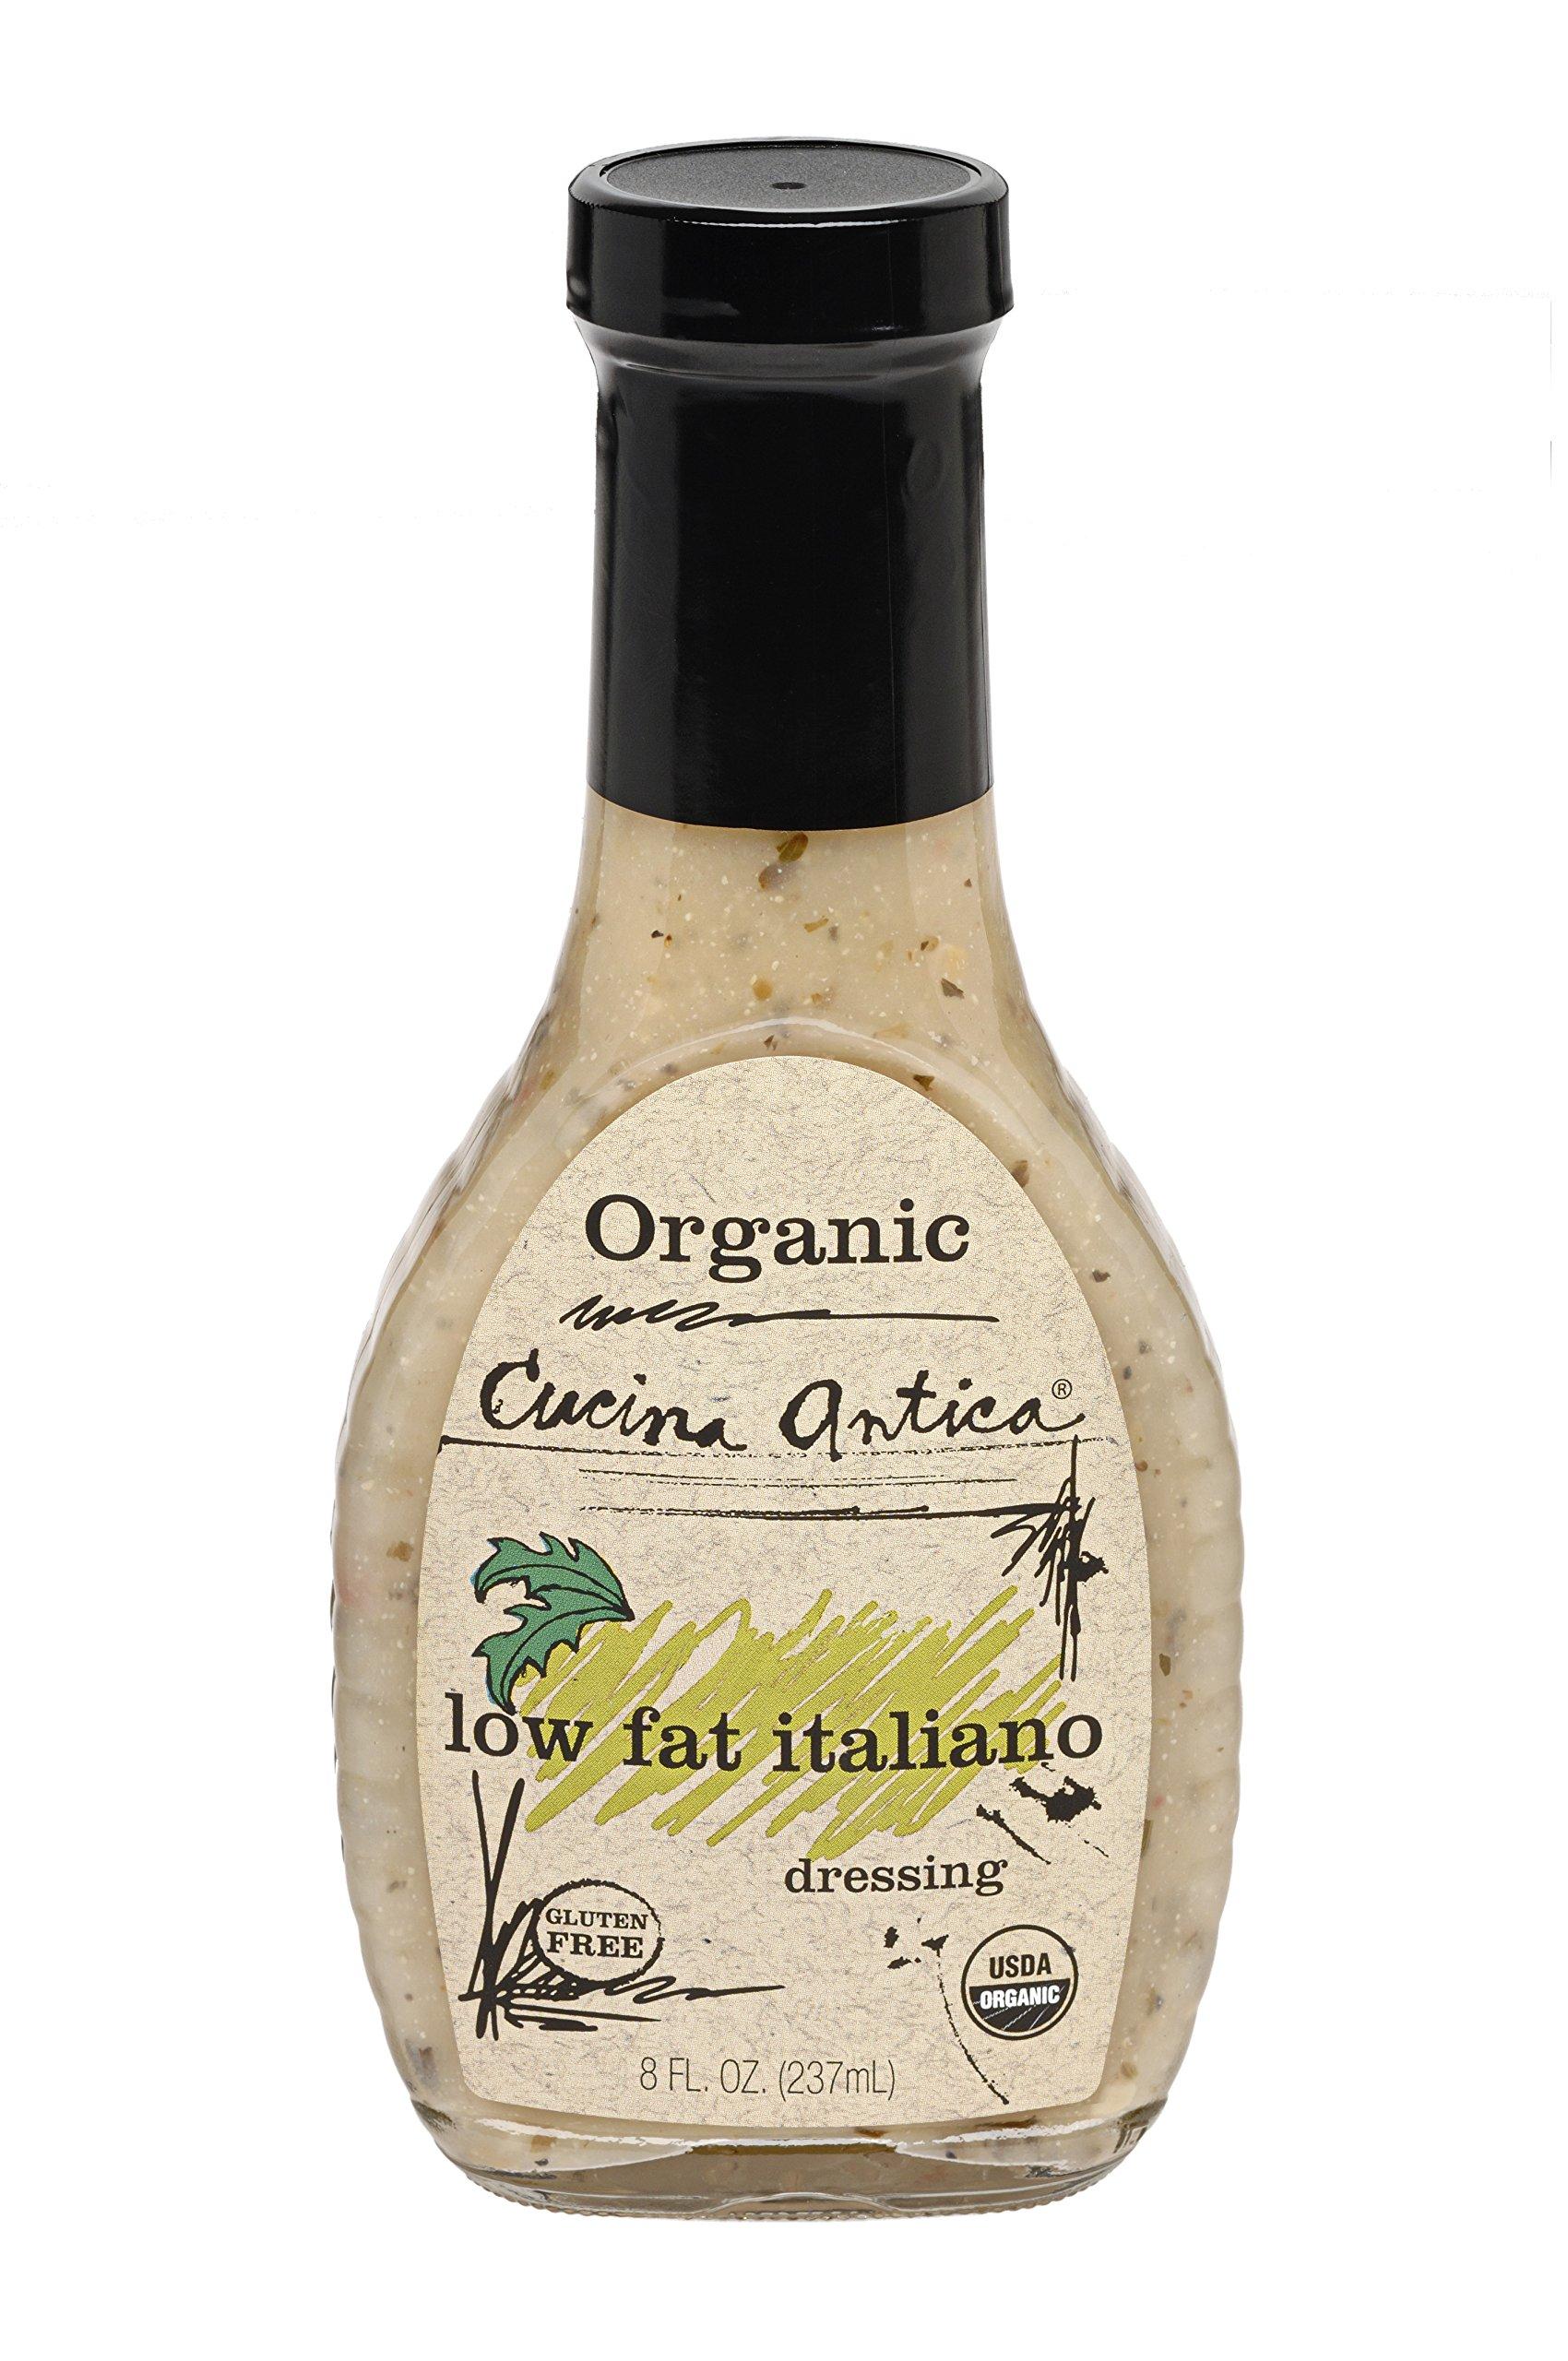 Cucina Antica Organic Low Fat Italiano Dressing, 8 oz